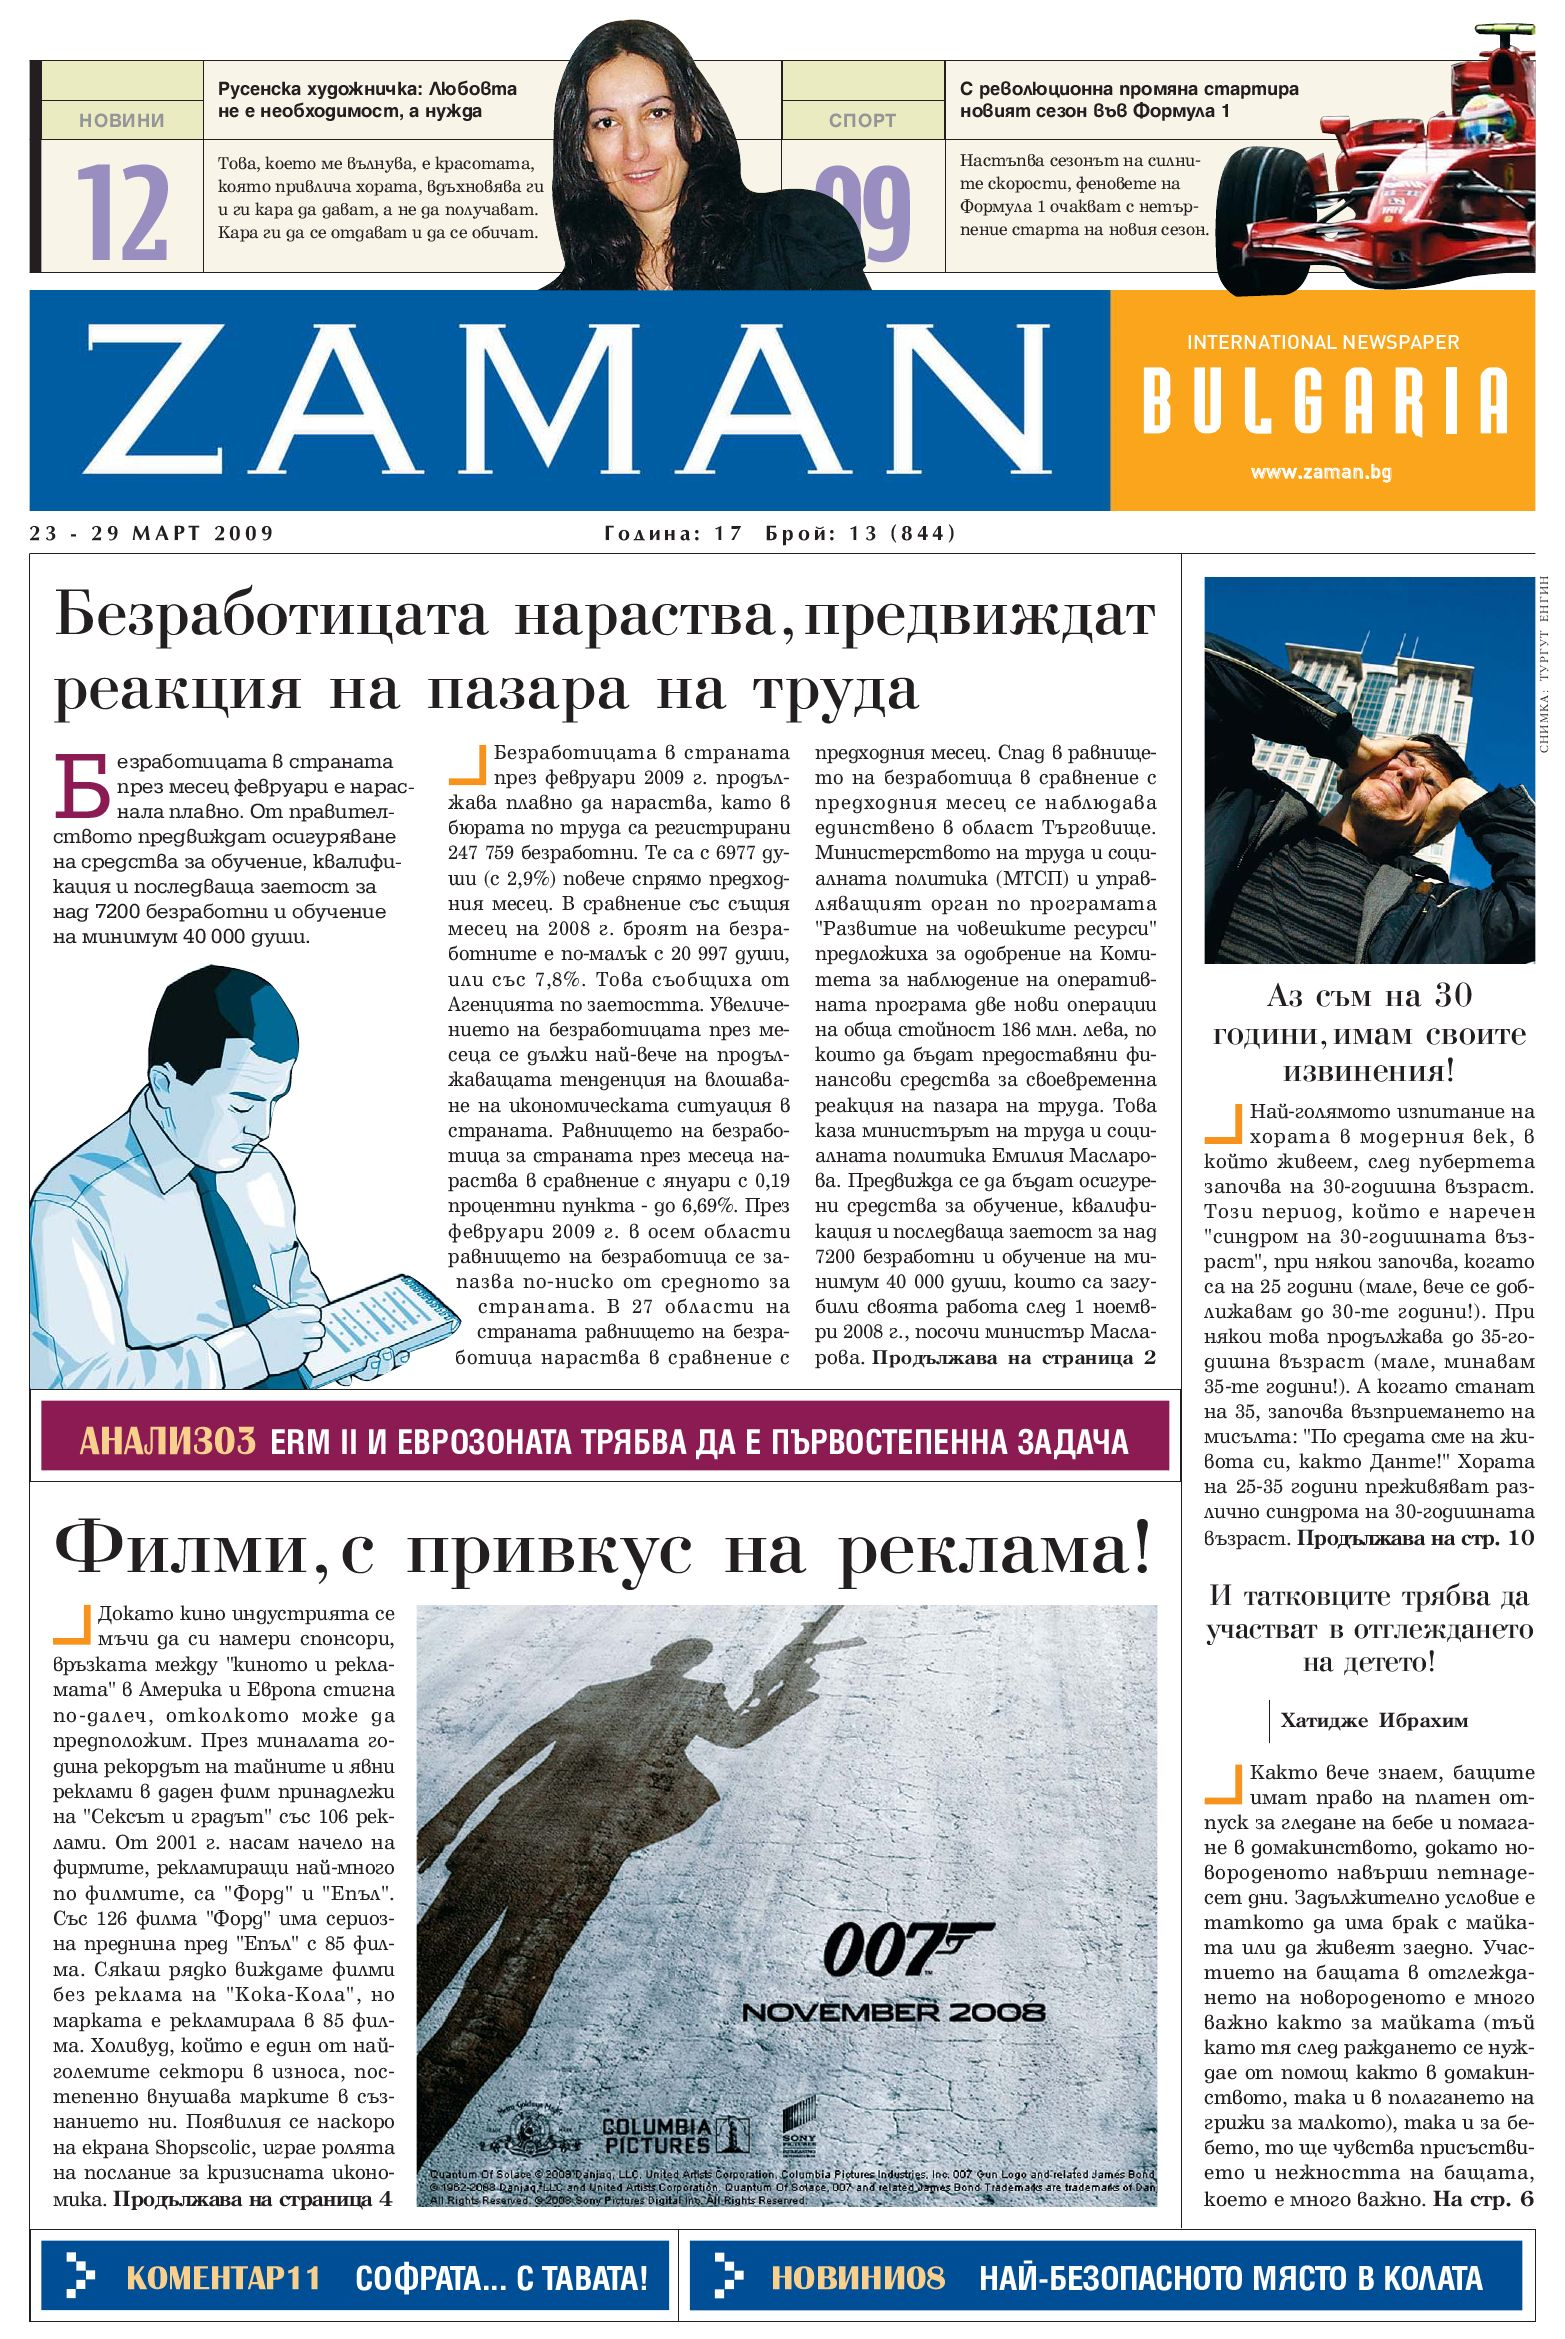 Zaman Bulgaristan Sayi 13 2009 By Zaman Bulgaristan Issuu